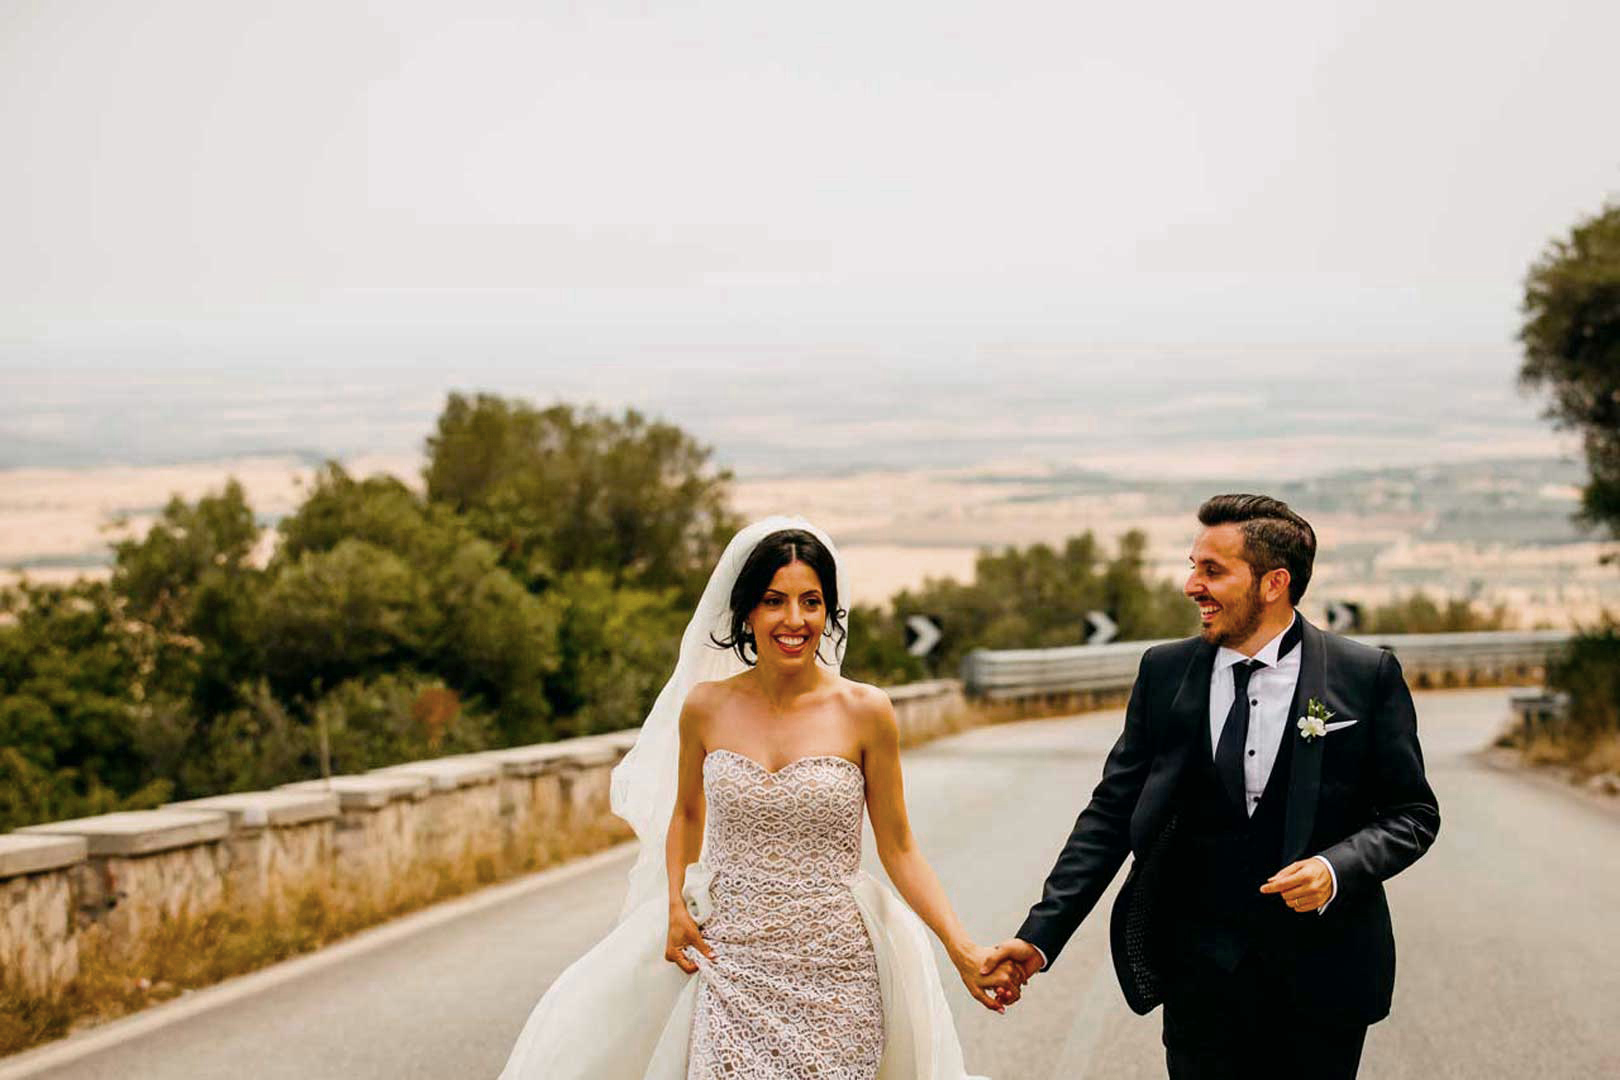 022-wedding-puglia-gianni-lepore-foto